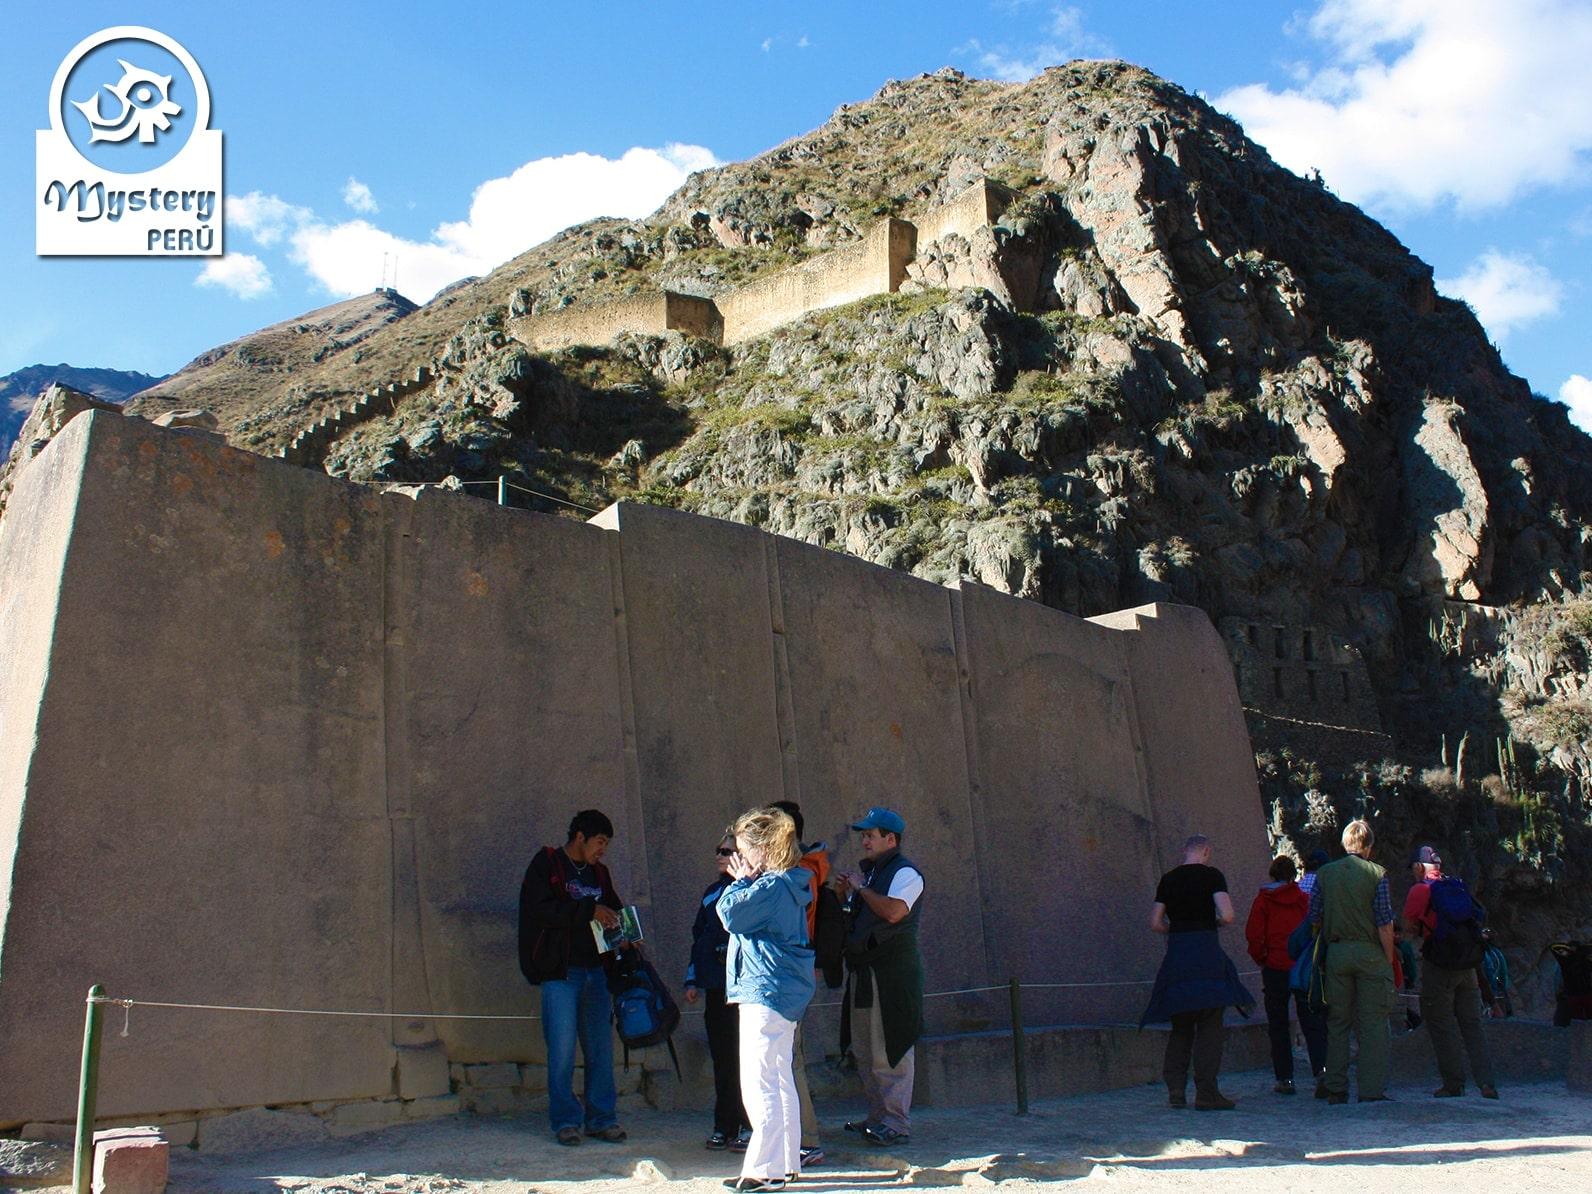 Tour al Valle Sagrado terminando en Ollantaytambo